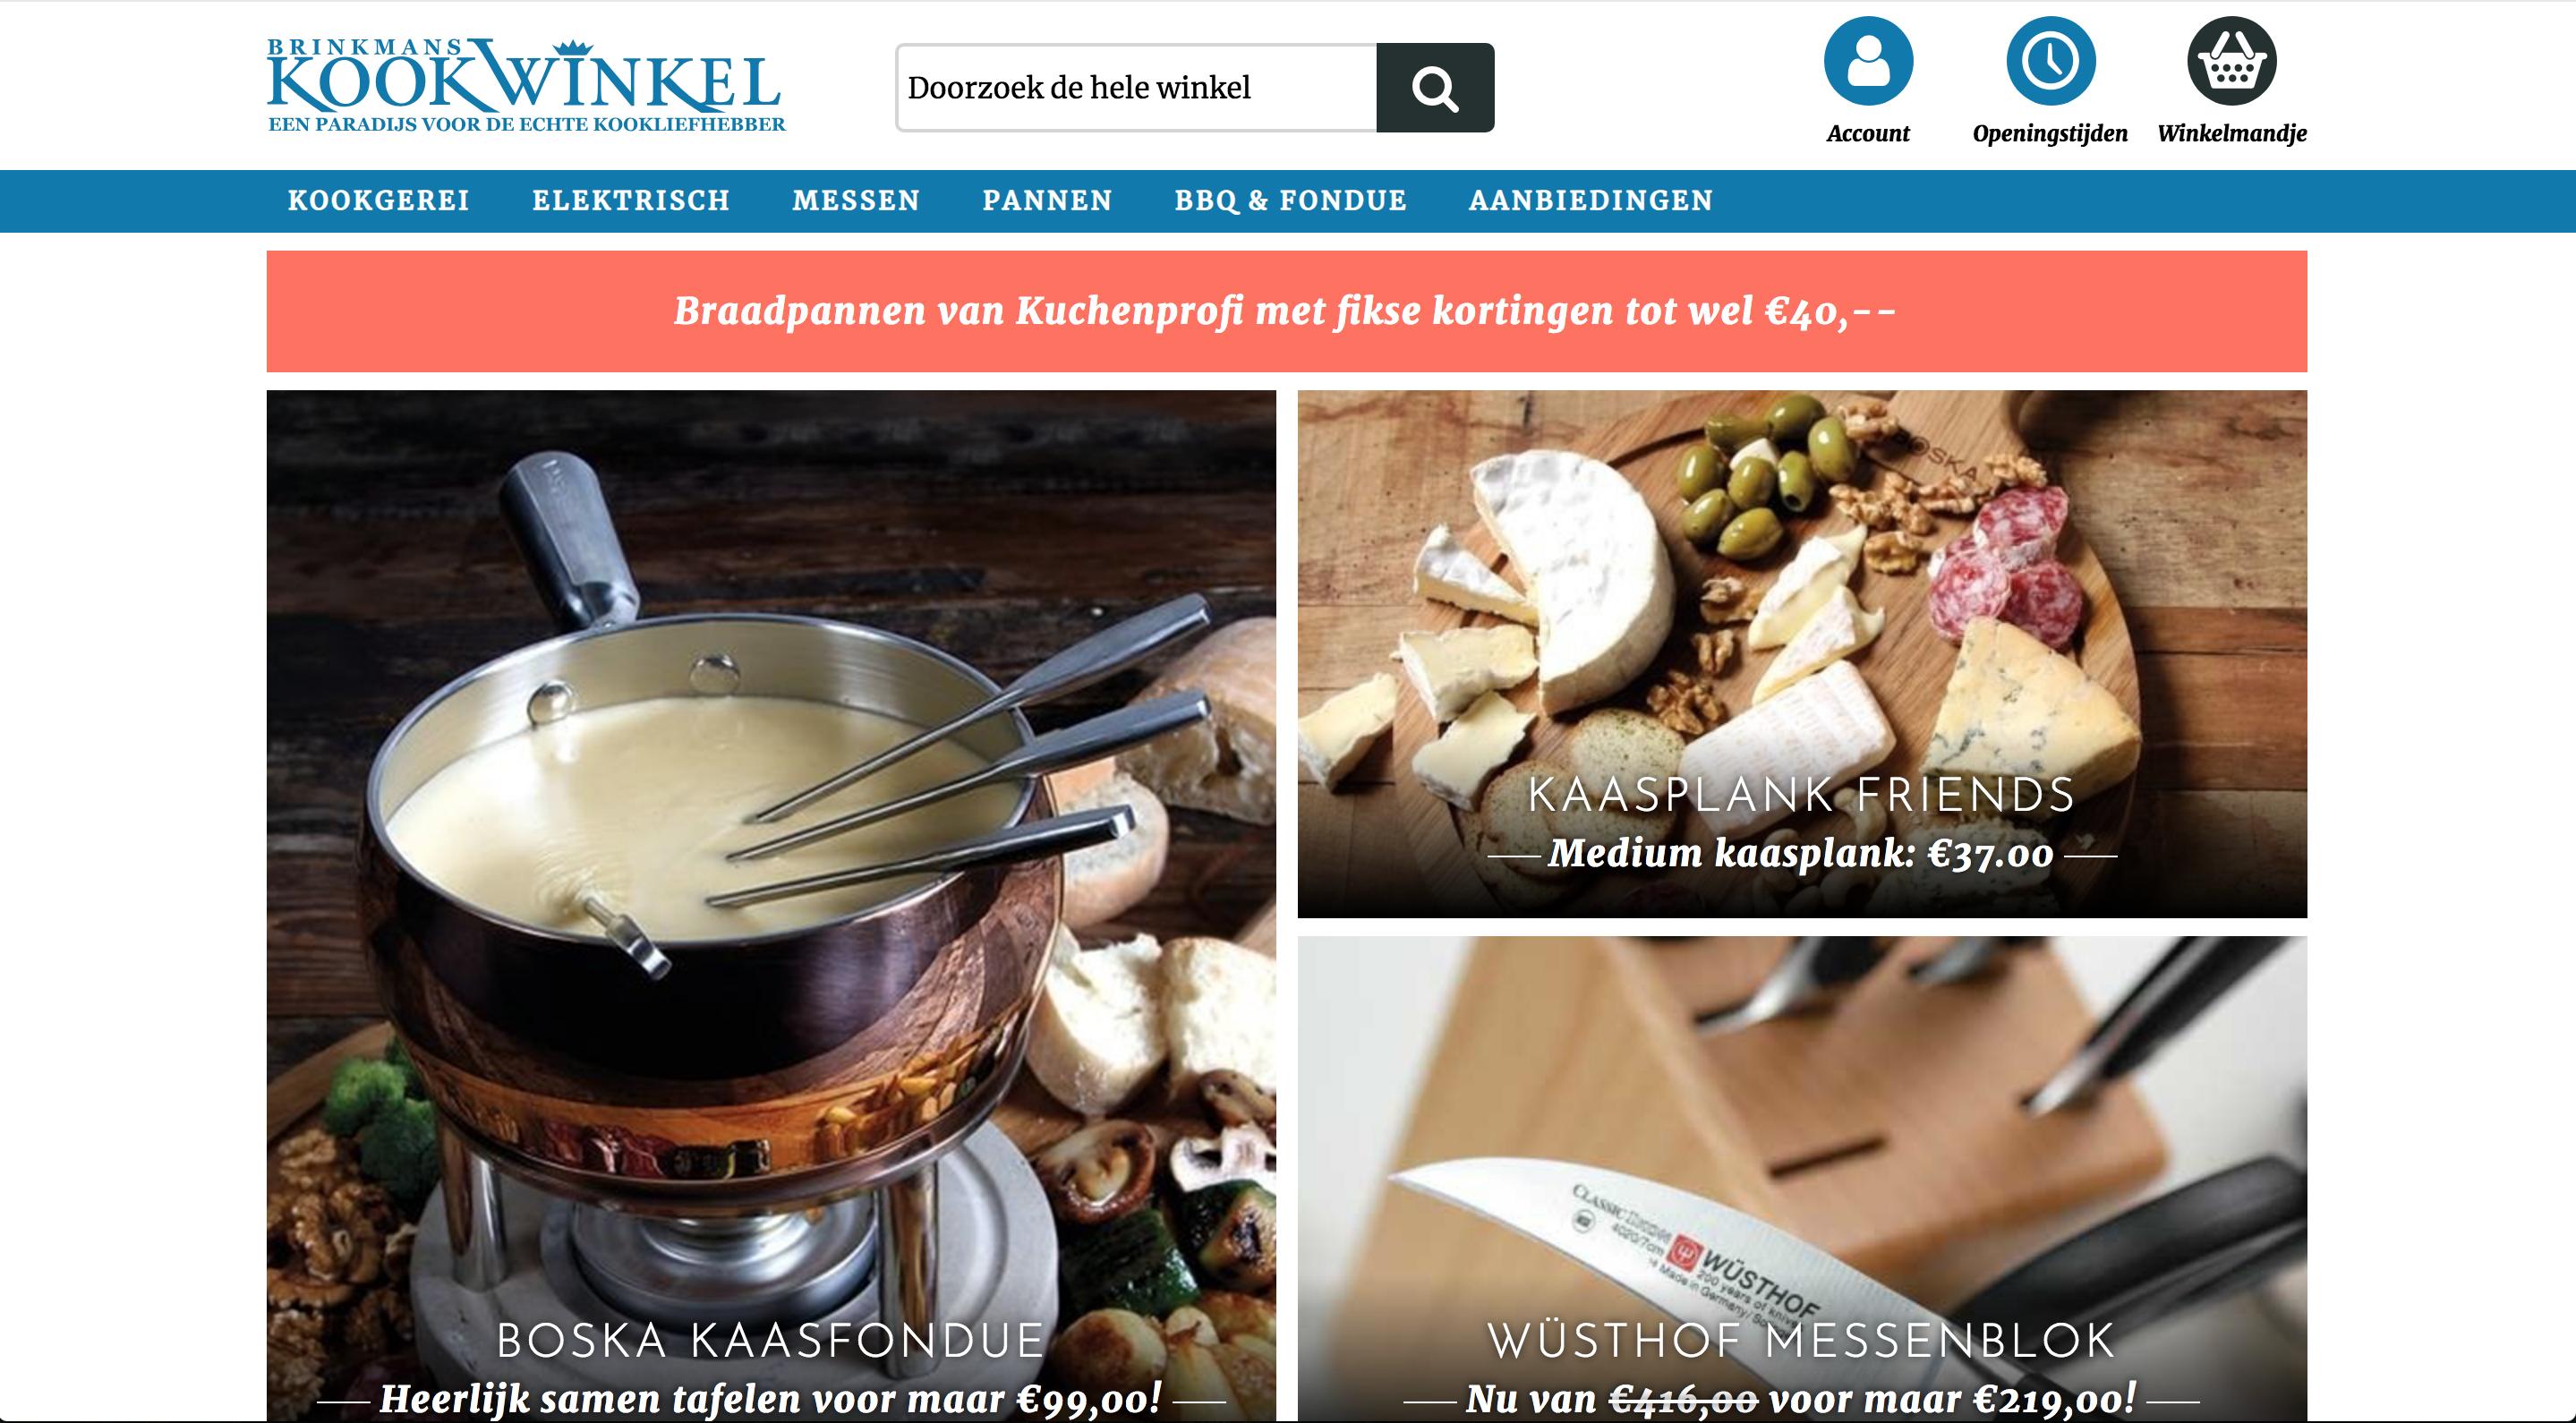 Dennis van Oers - Brinkmans Kookwinkel